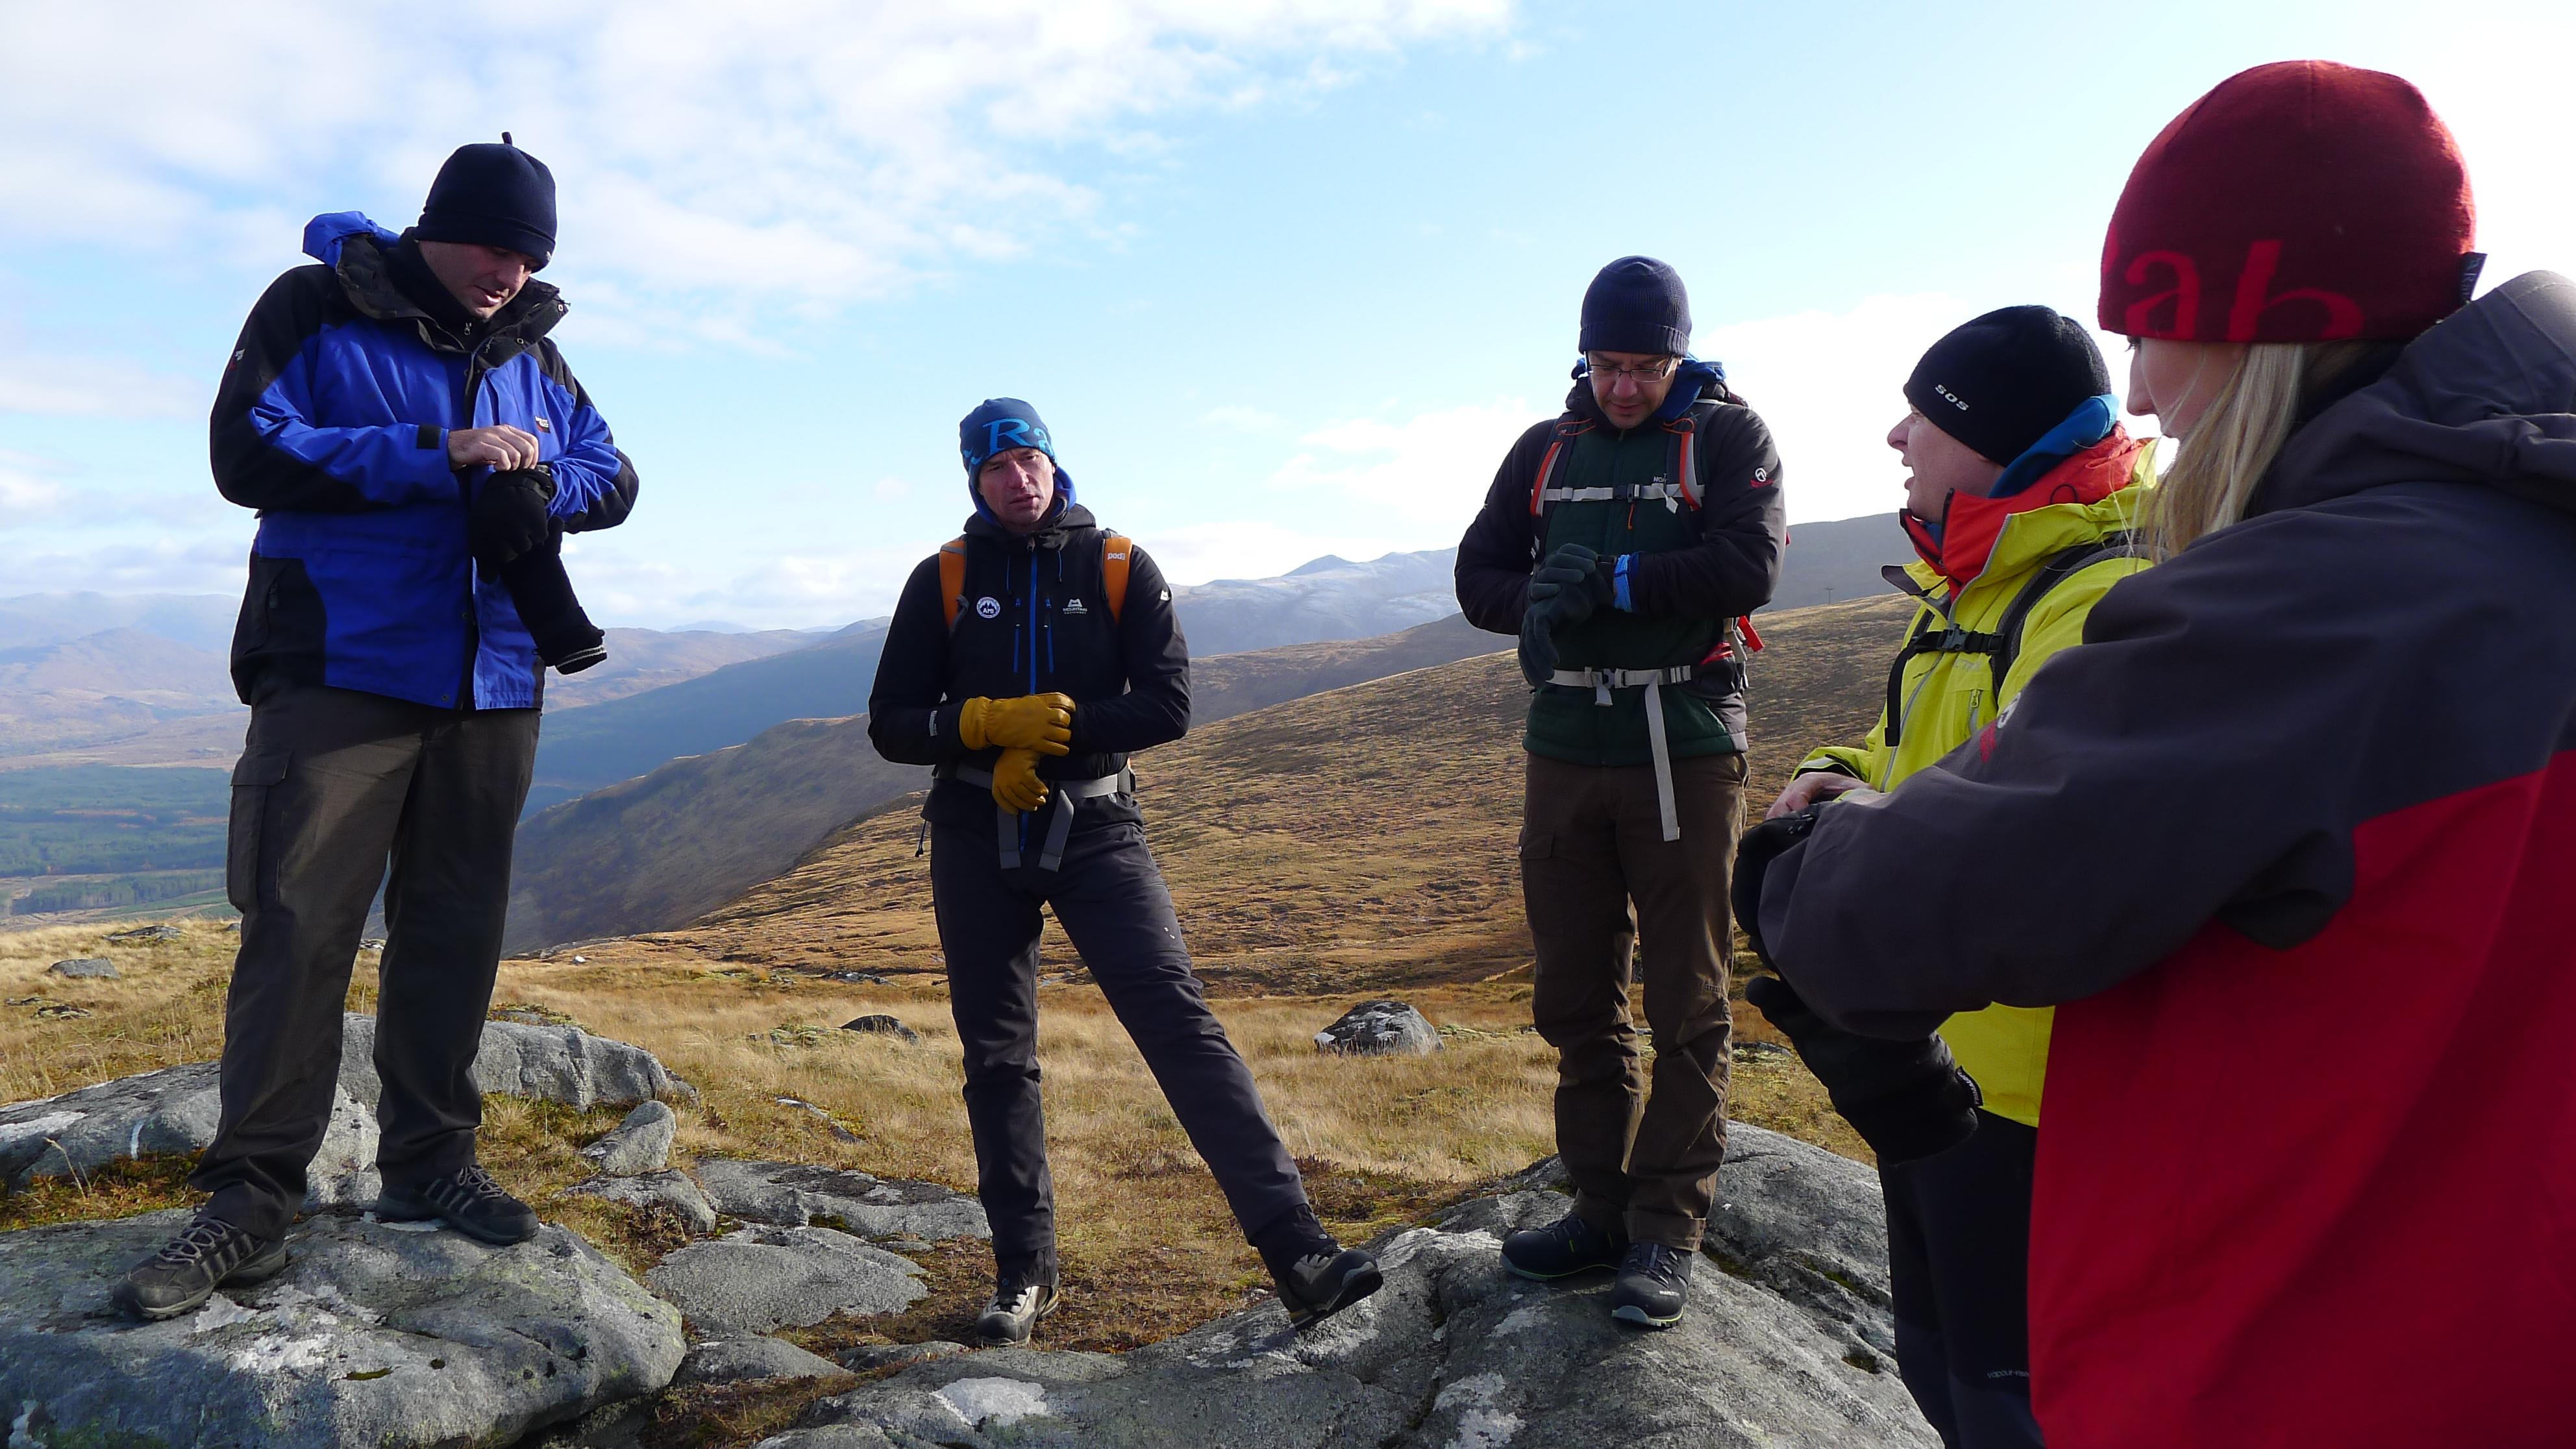 garmin begins partnership with the association of mountain rh garmin com Accounting Training Guide mountain guide training uk